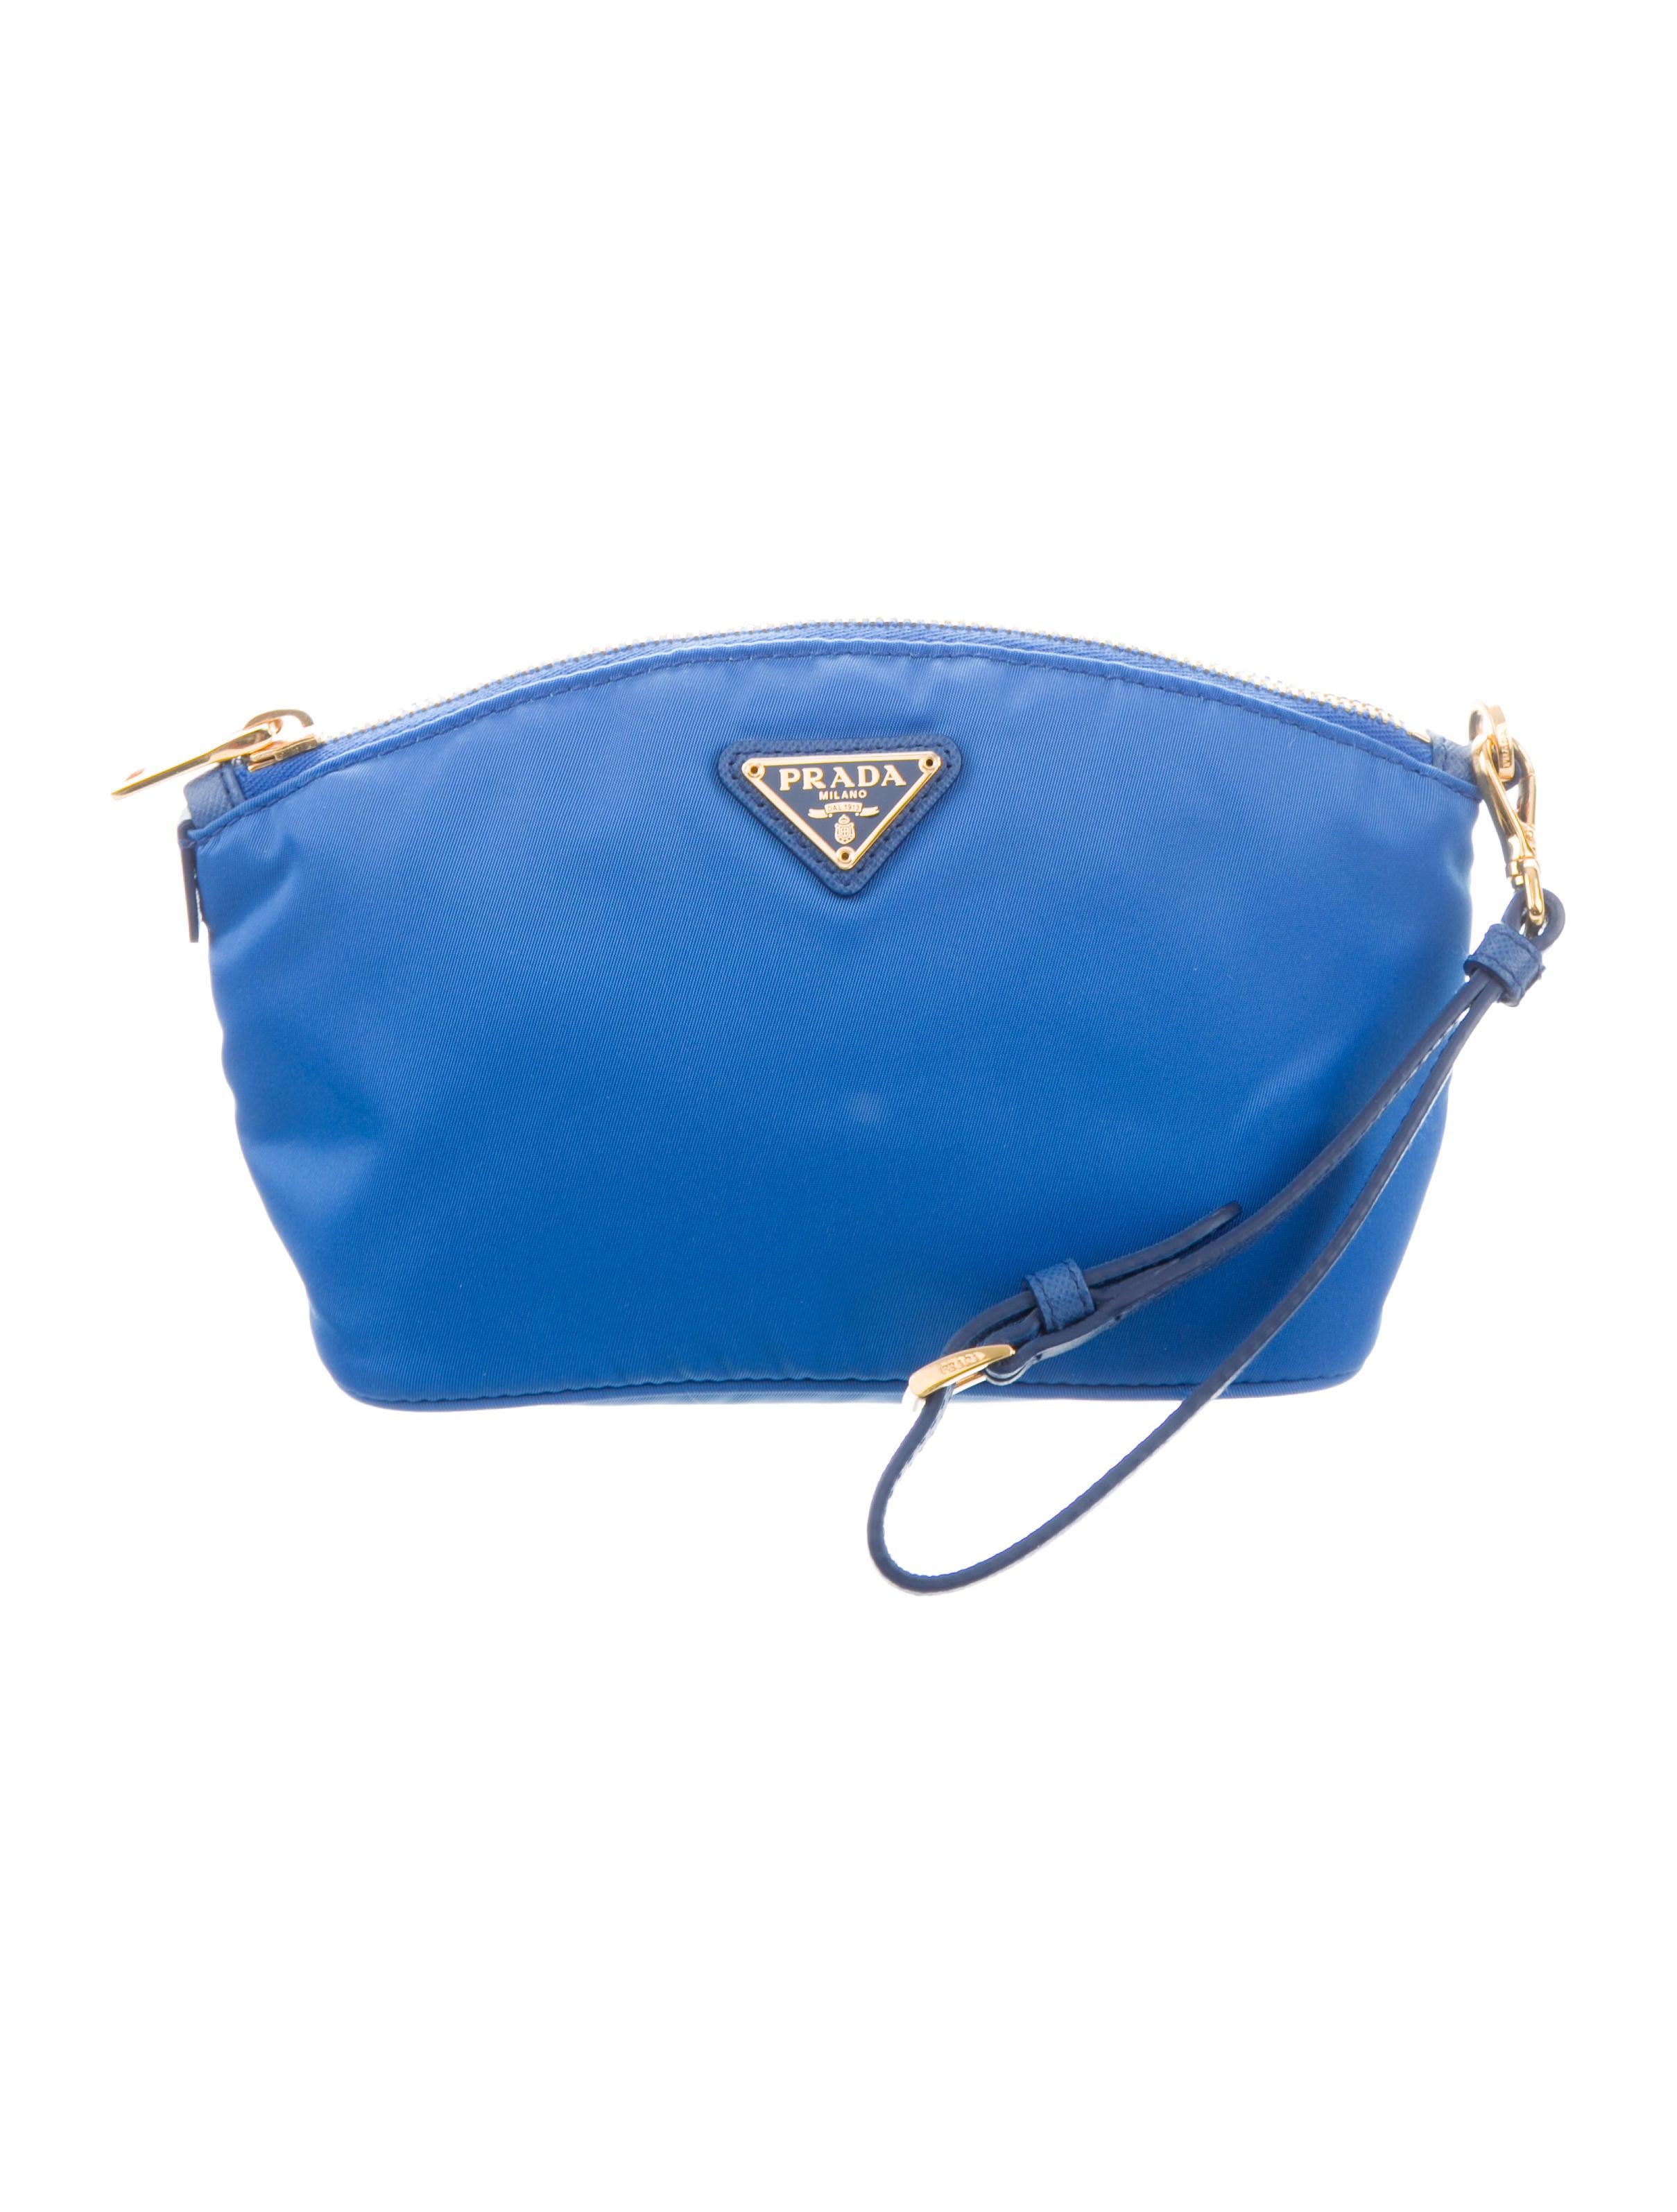 f03a68135c3a62 Prada Tessuto Nylon Wristlet - Handbags - PRA285390 | The RealReal